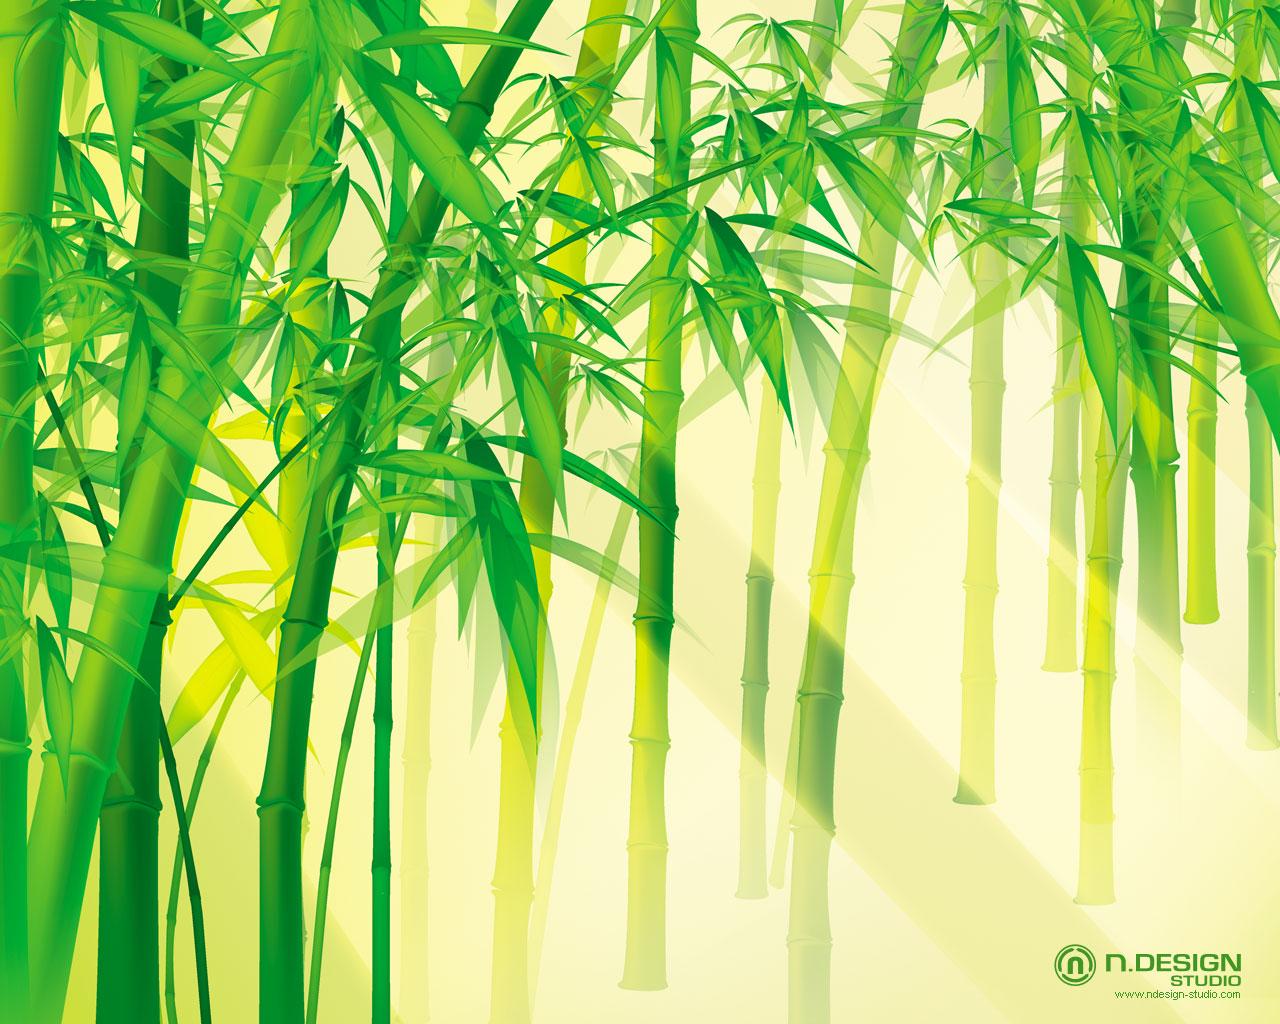 http://2.bp.blogspot.com/-d_nLEy8IUnU/Tk065Atgd1I/AAAAAAAAI5I/BZ9GQF0NeAQ/s1600/bamboo+wallpaper+scene-1280x1024.jpg